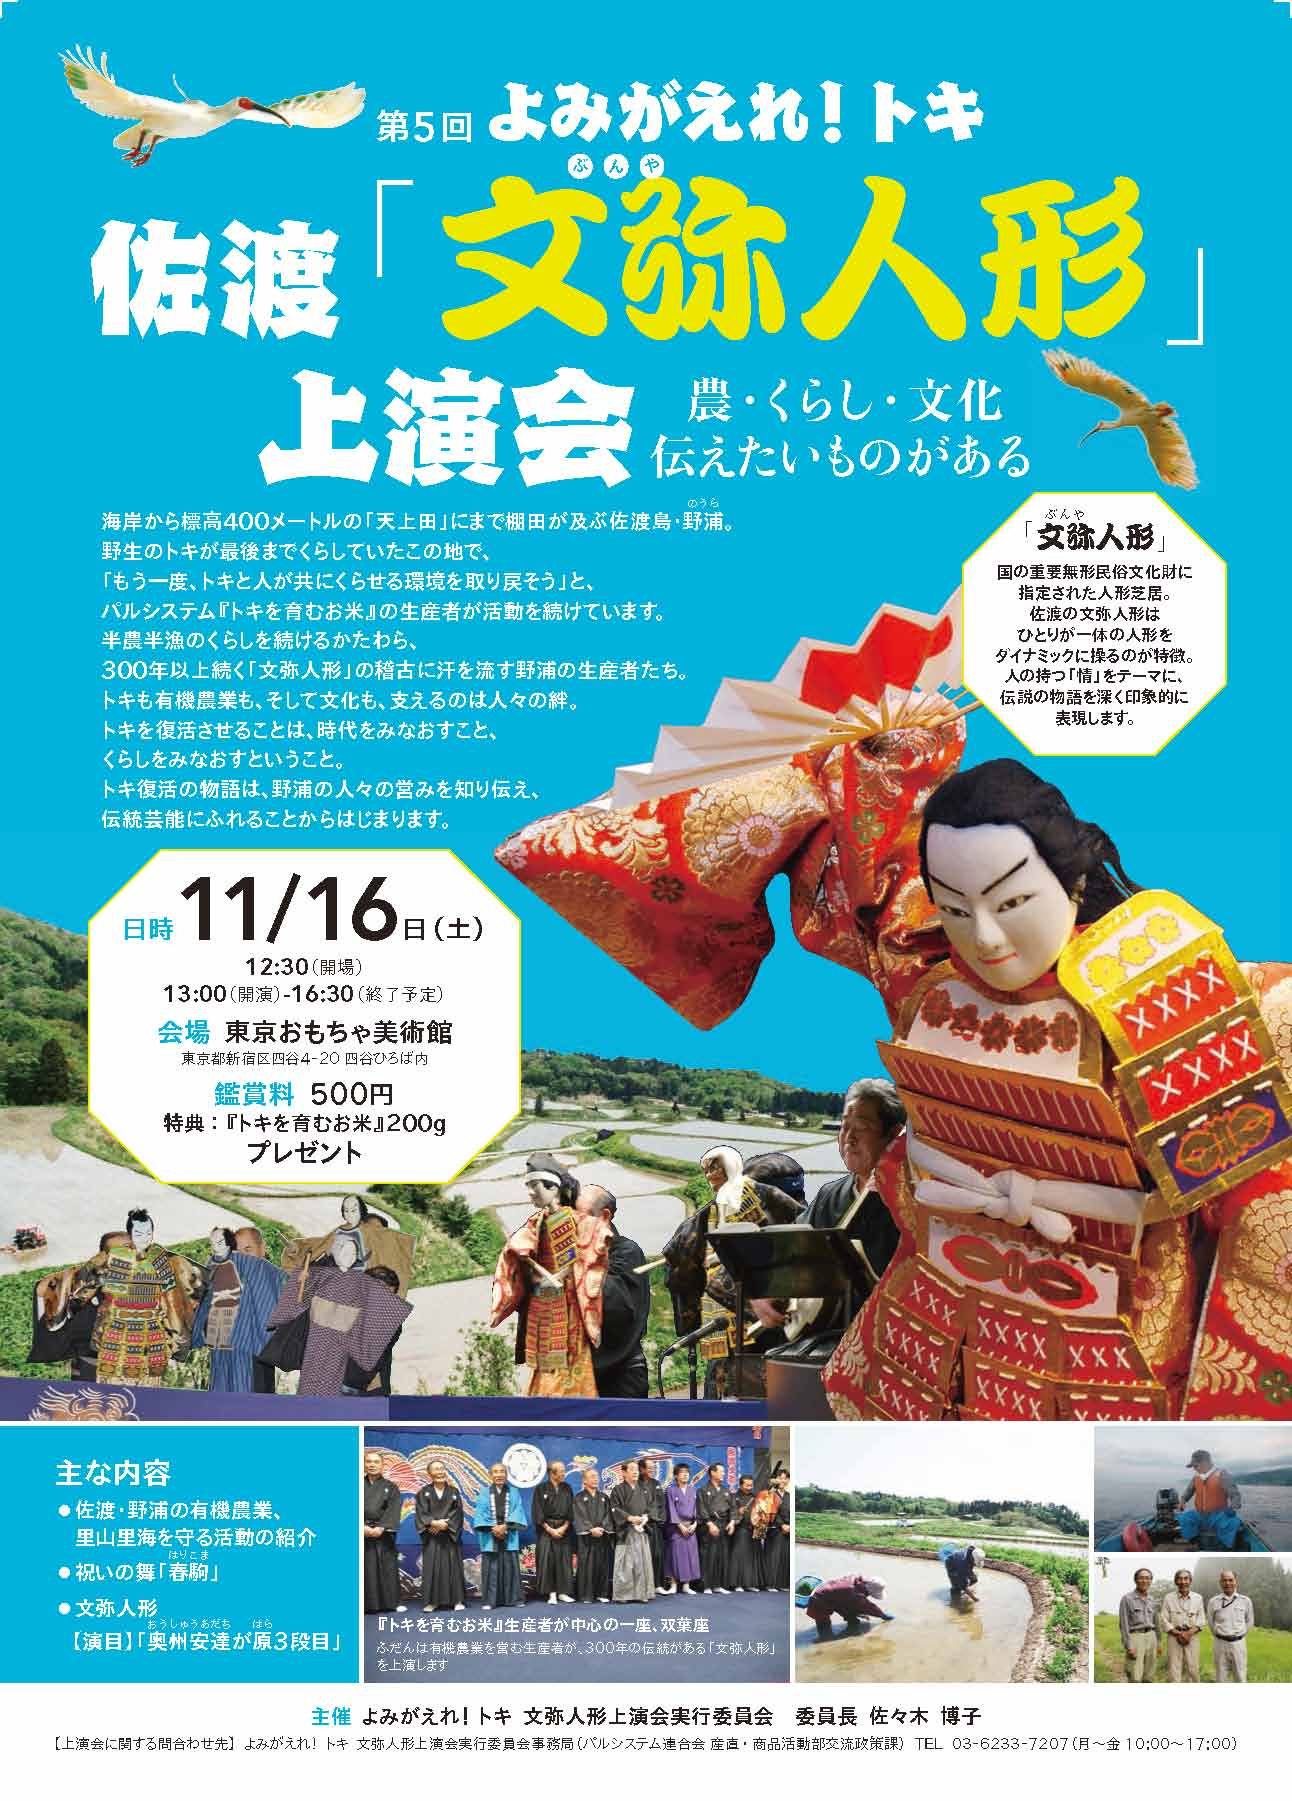 http://www.jacom.or.jp/news/images/nous1311010401.jpg